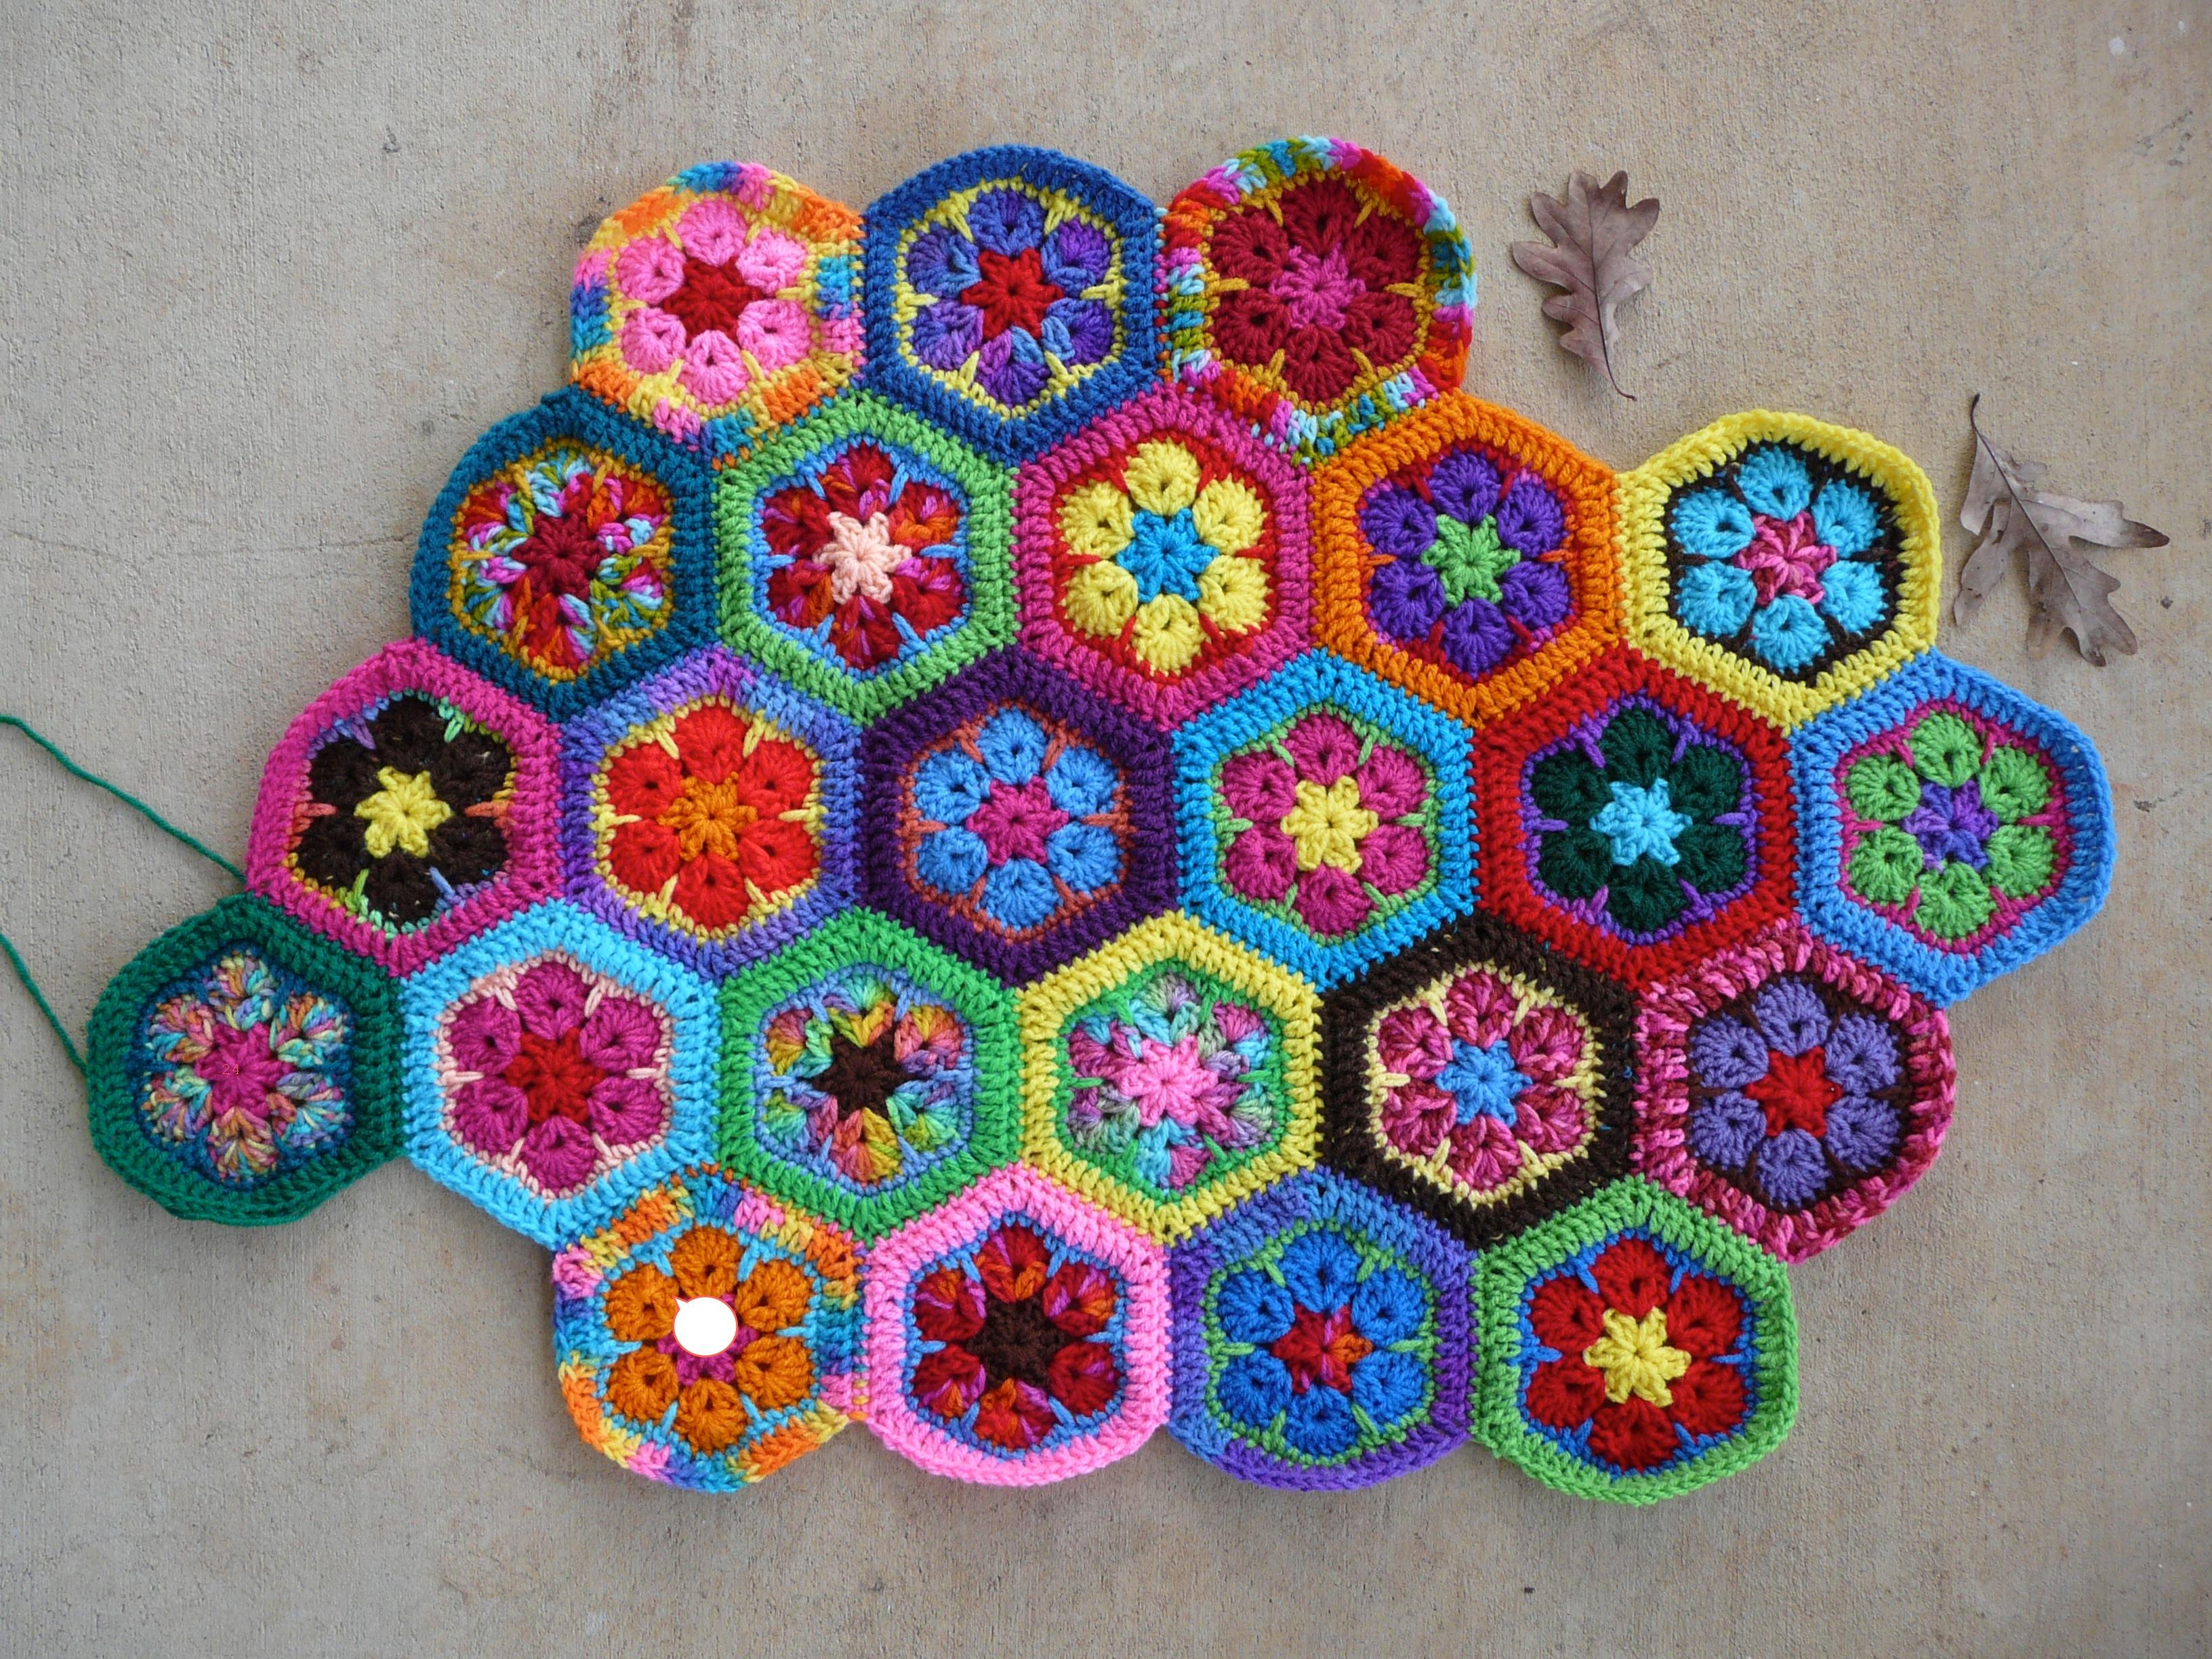 African Flower Crochet Pattern Half : If Victorians texted - Crochetbug